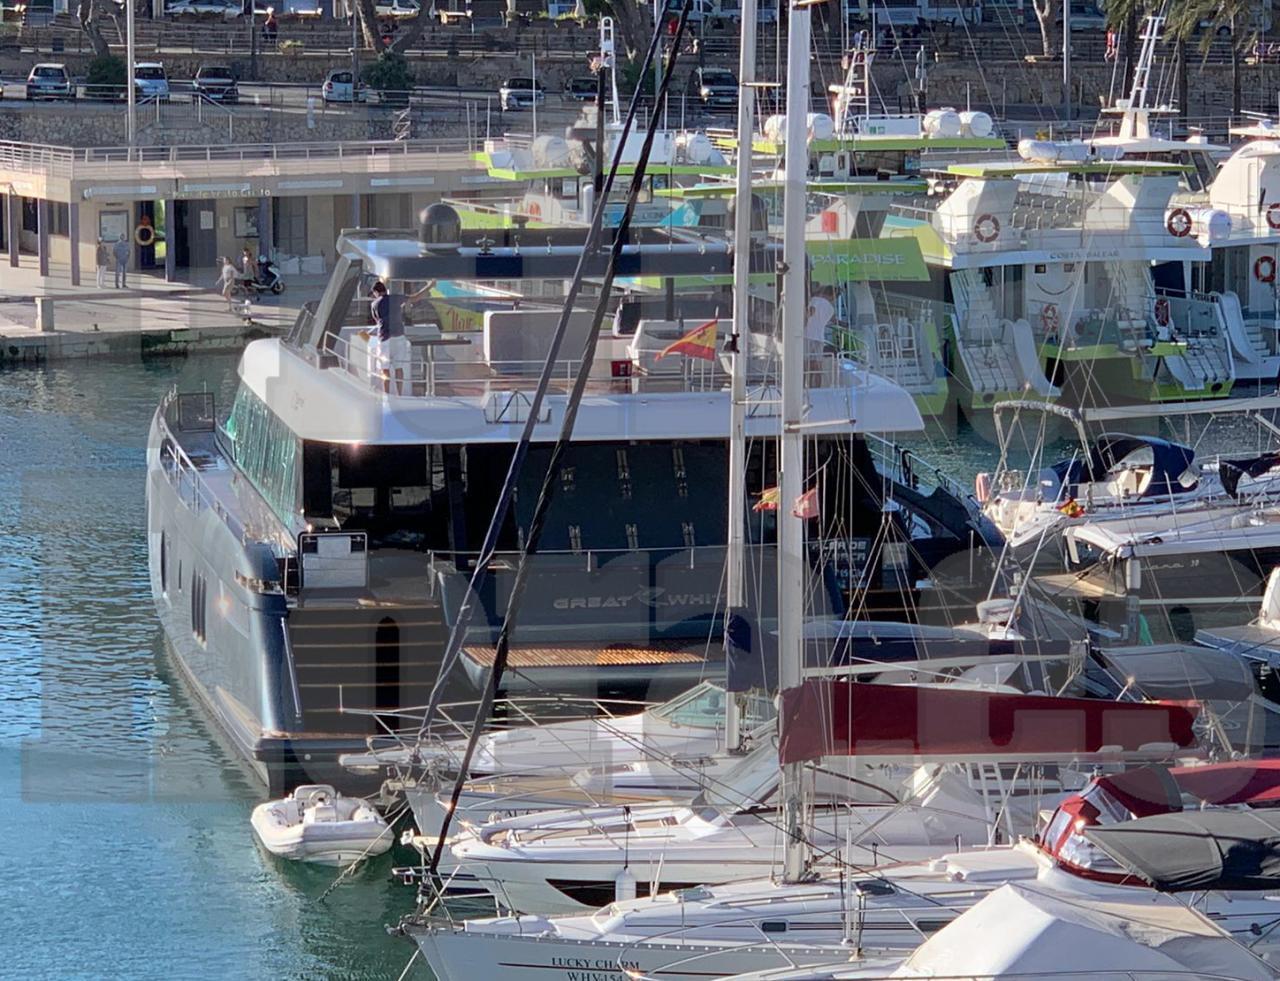 Rafa Nadal's new catamaran has arrived in Porto Cristo.